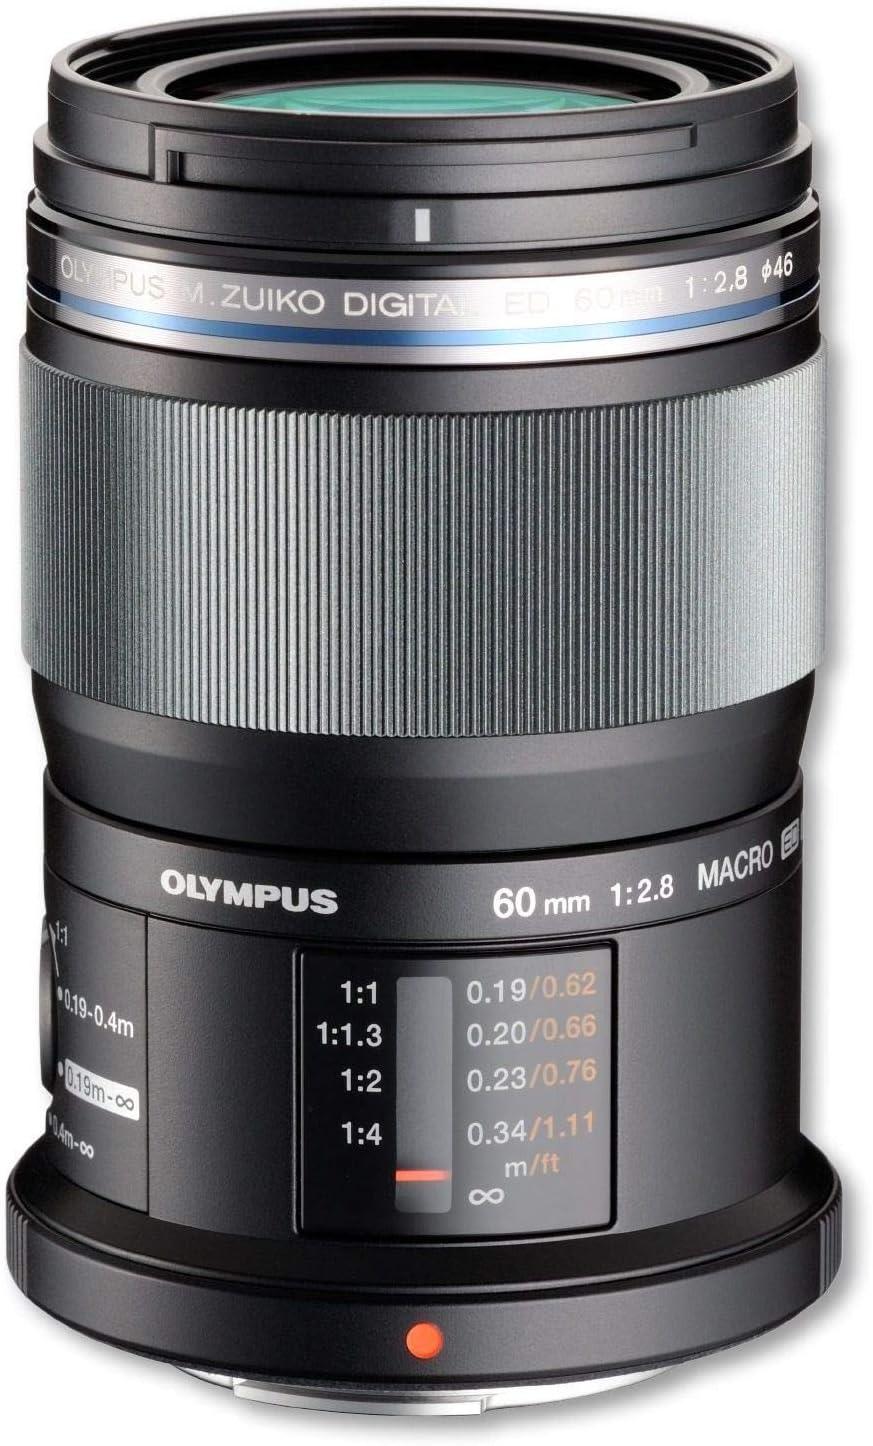 Olympus M.Zuiko - Objetivo digital ED 60 mm F2.8, zoom estándar, apto para todas las cámaras MFT (modelos olympus OM - D & Pen, serie G de Panasonic), negro